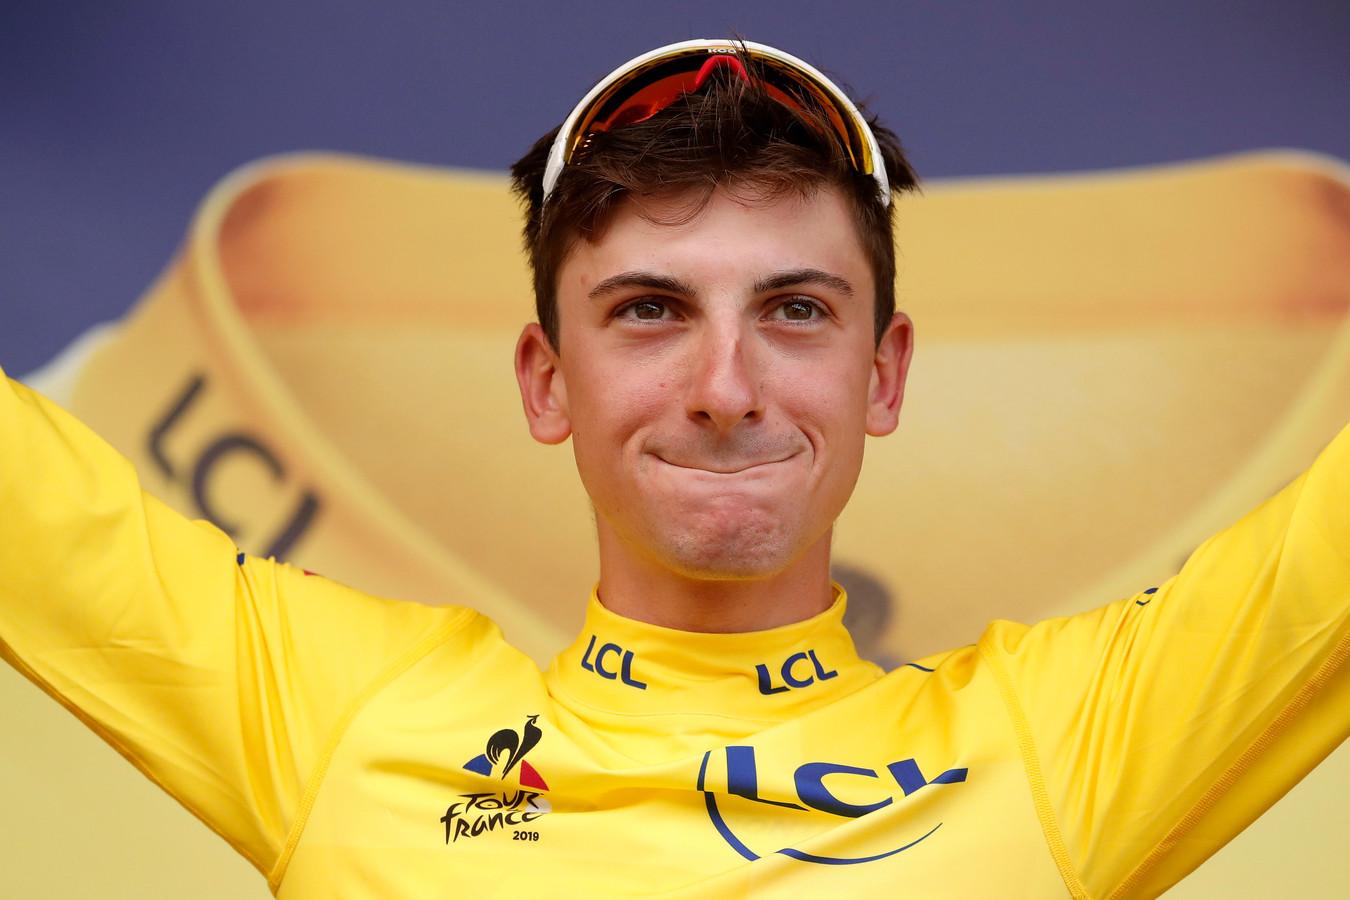 Giulio Ciccone is de nieuwe geletruidrager in de Tour de France.